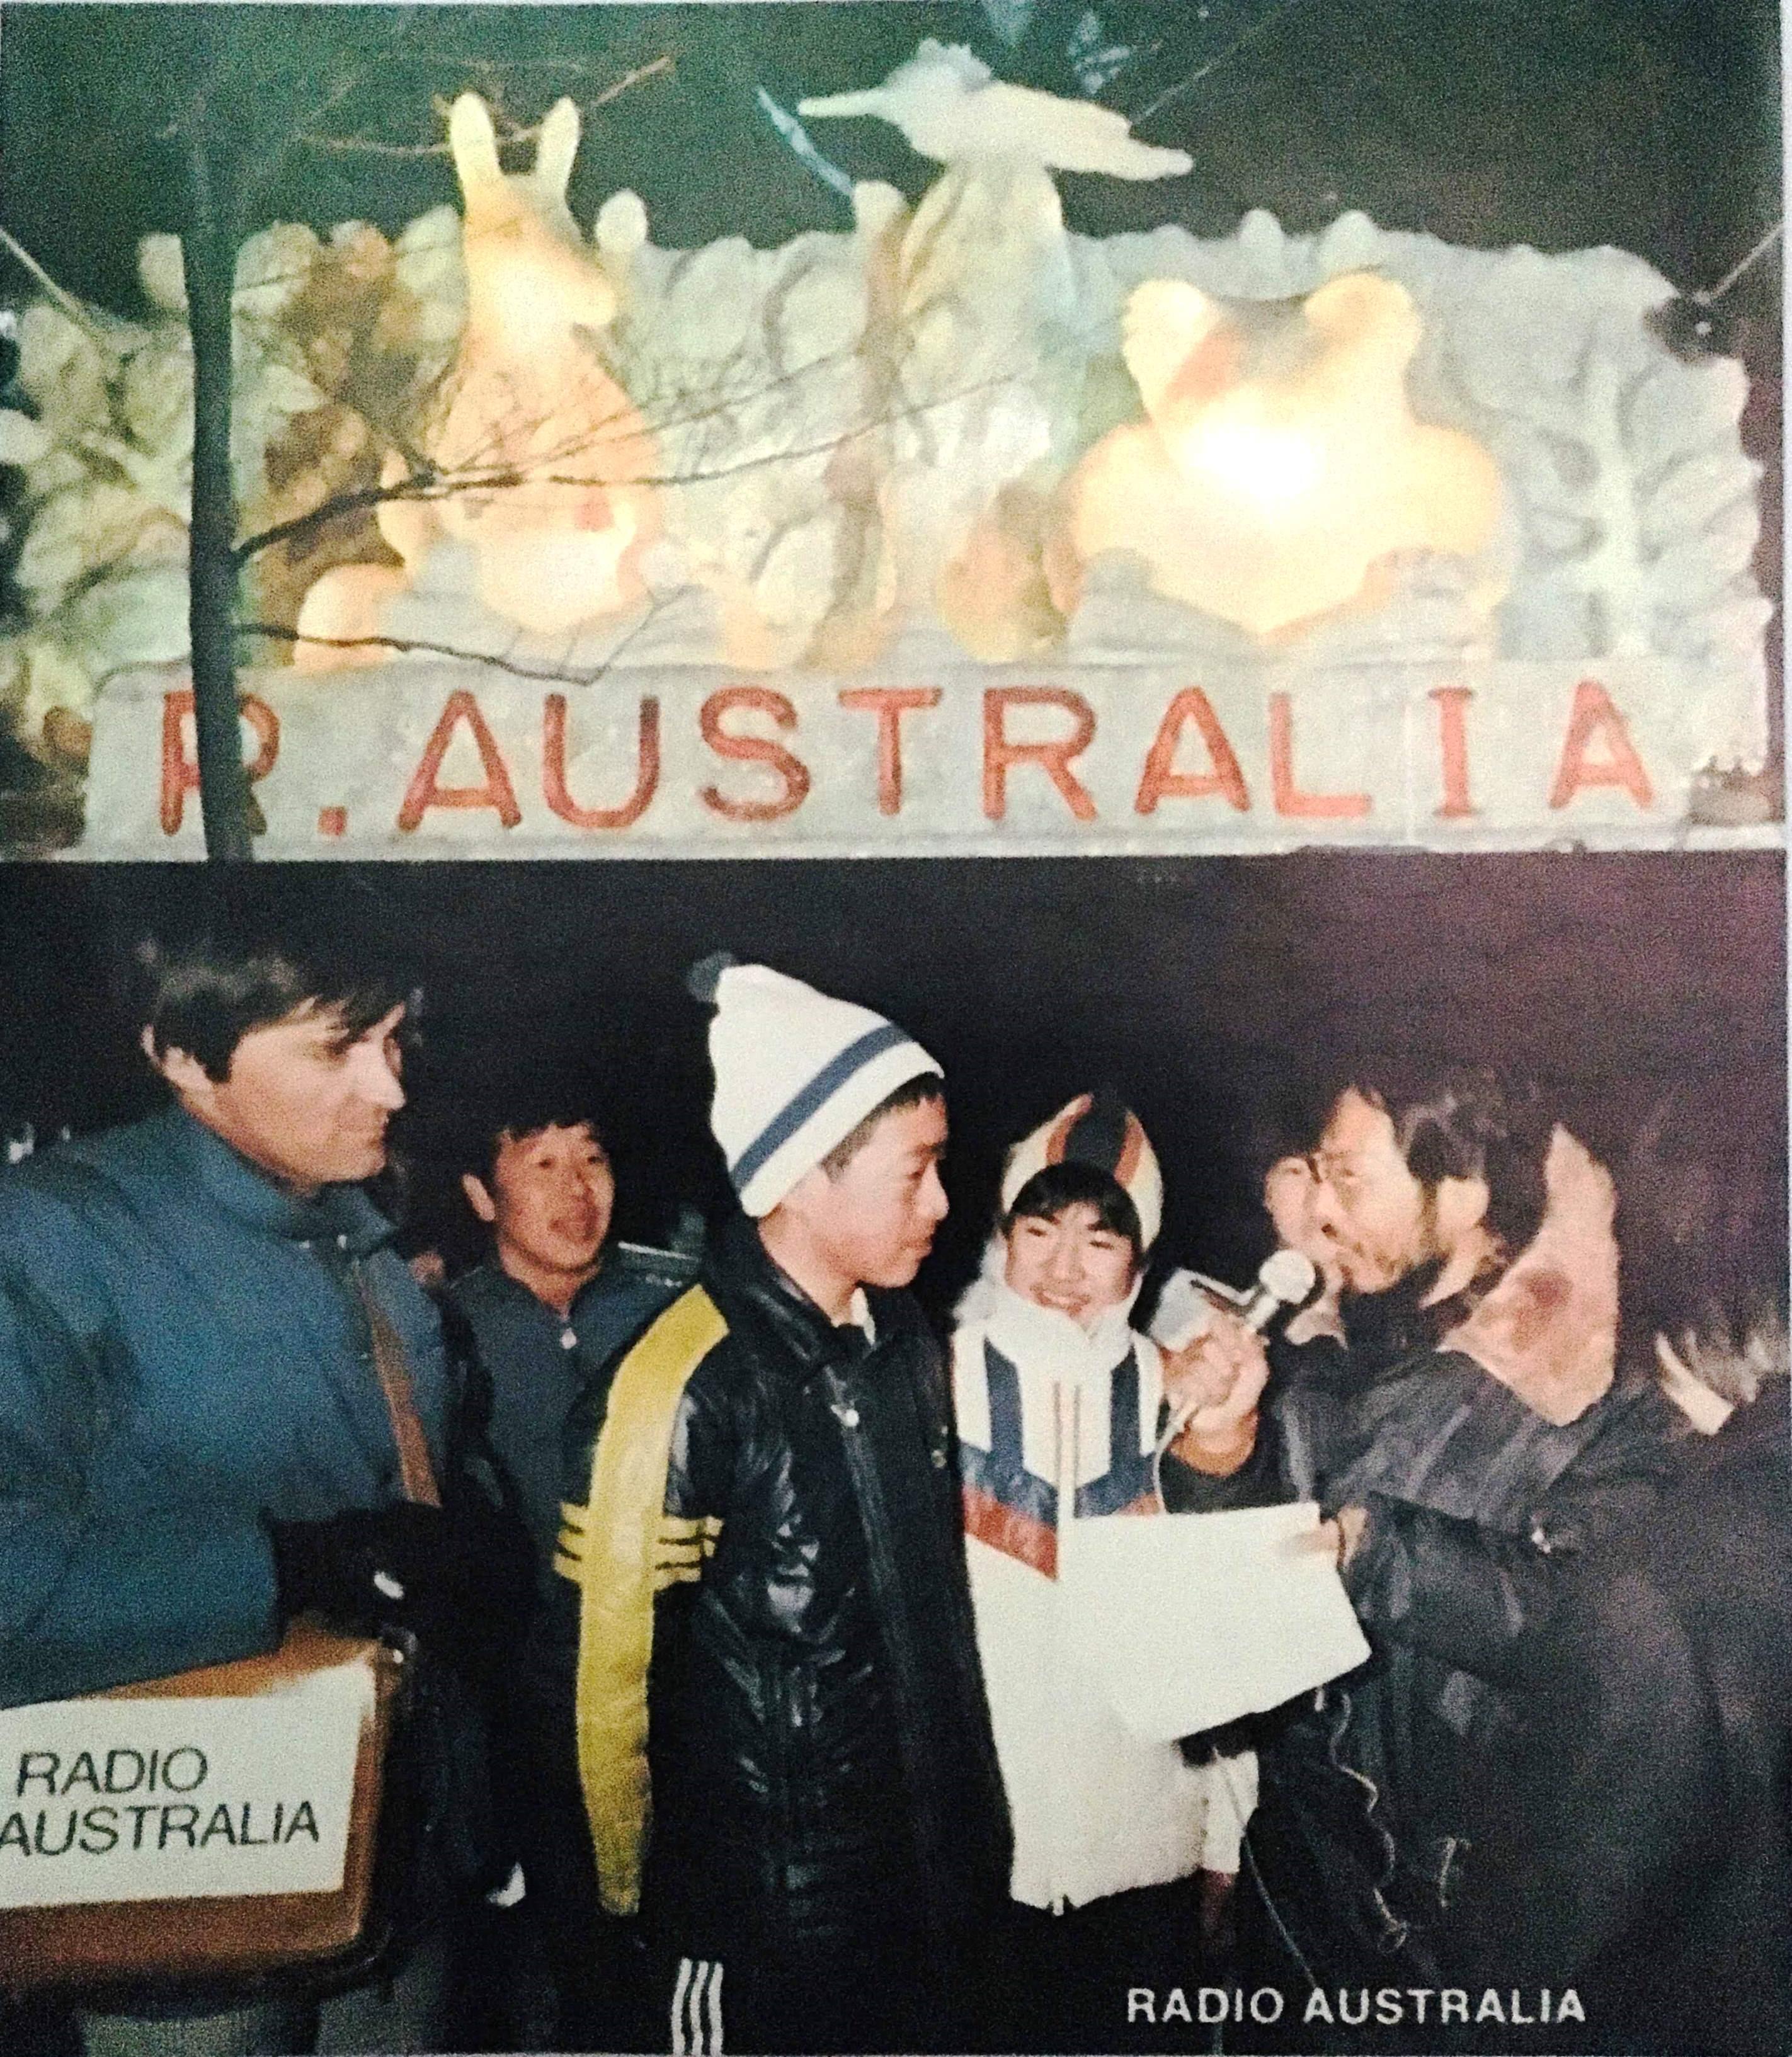 【BCLワンダラー】私のお宝ベリカード「ラジオ・オーストラリア」